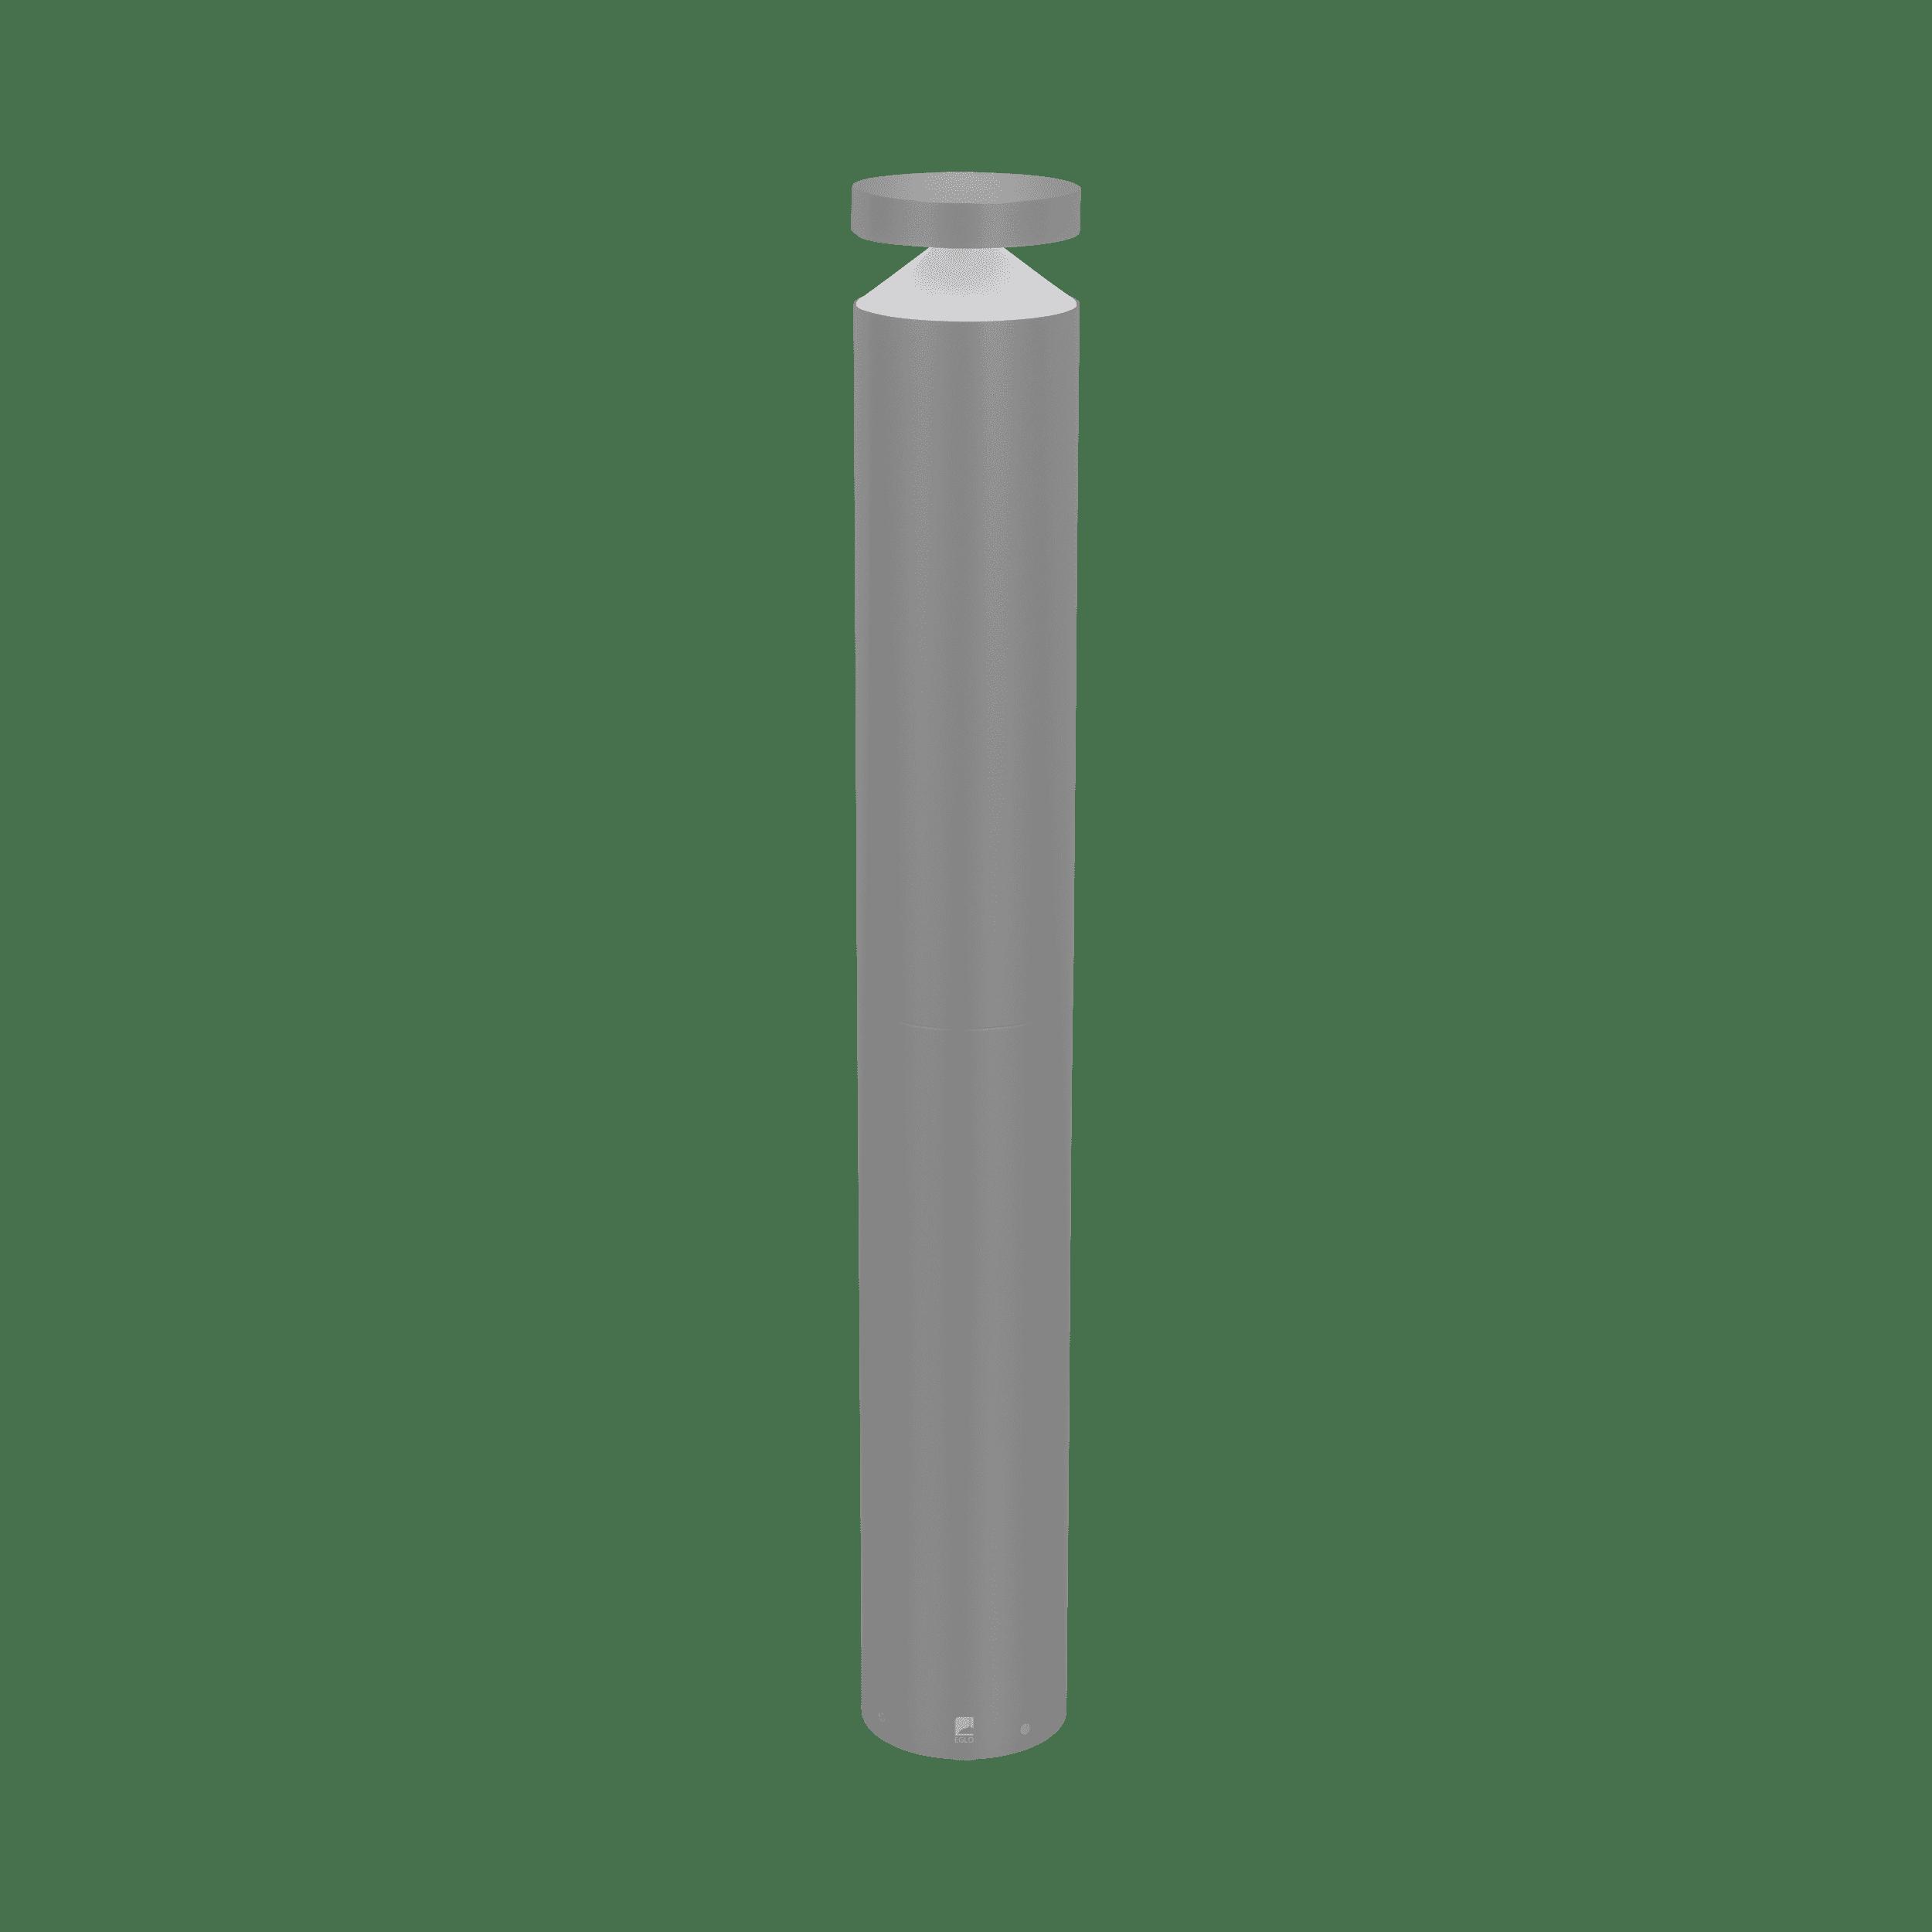 LED-ΚΟΛΟΝΑ ΕΞ.ΧΩΡΟΥ ΑΣΗΜΙ MELZO - 97302 - EGLO